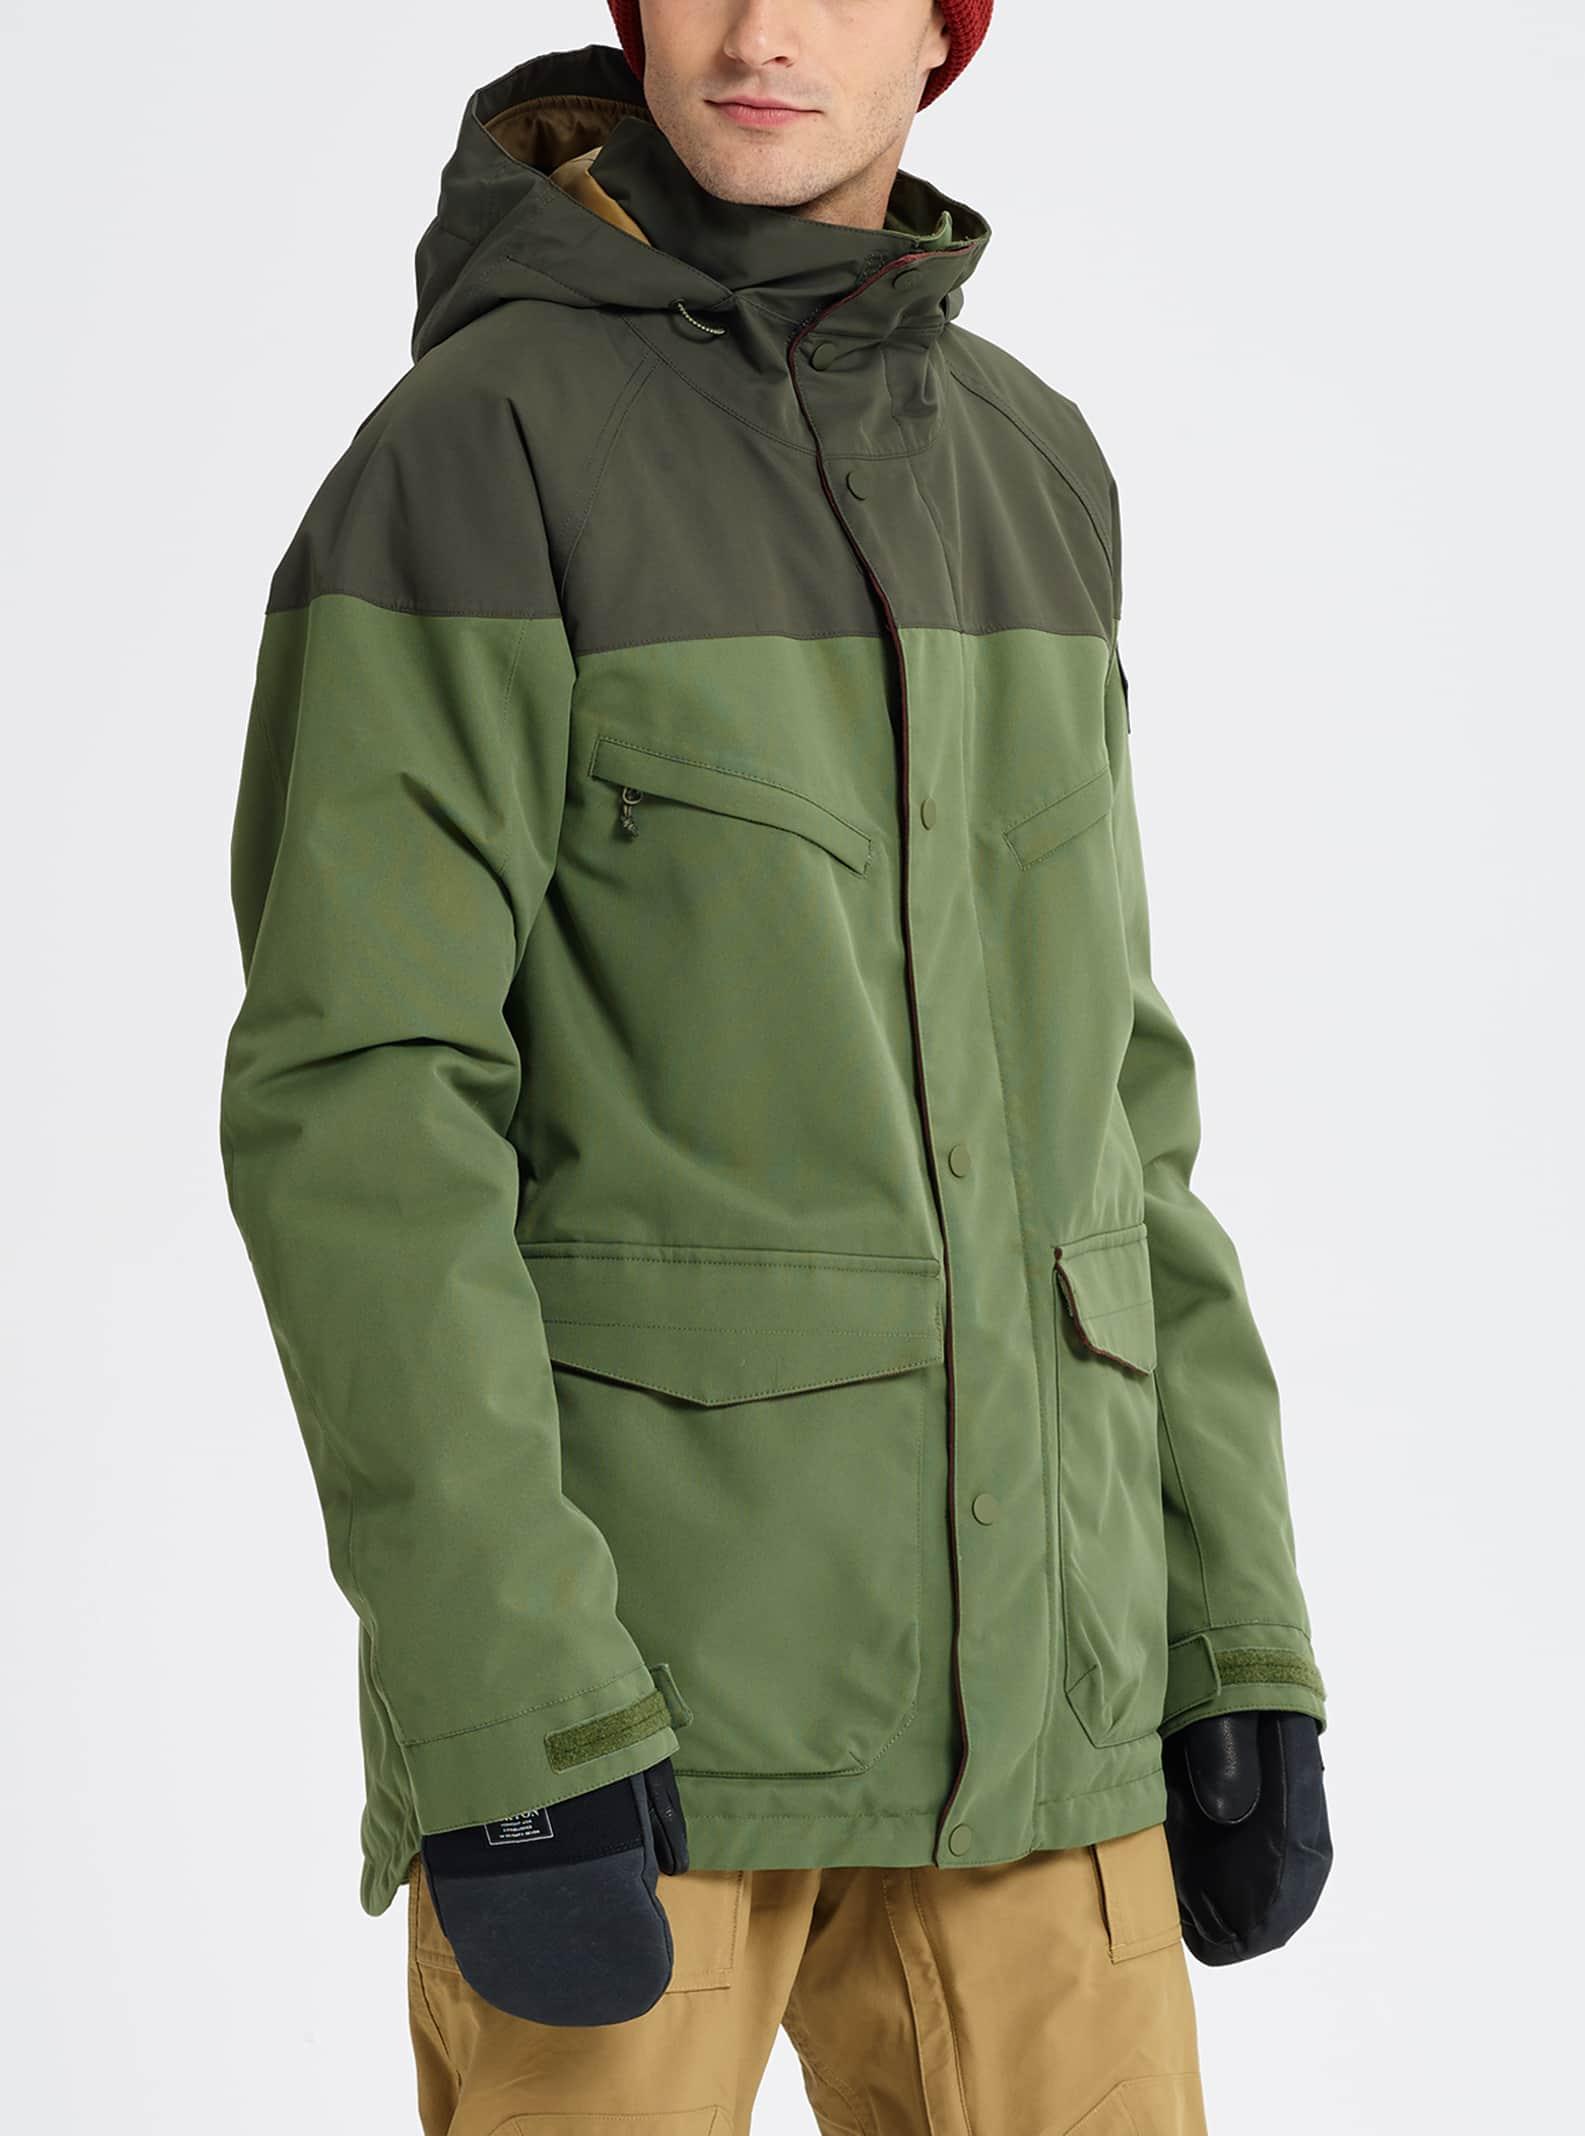 6a4f176d33 Men s Snowboard Jackets